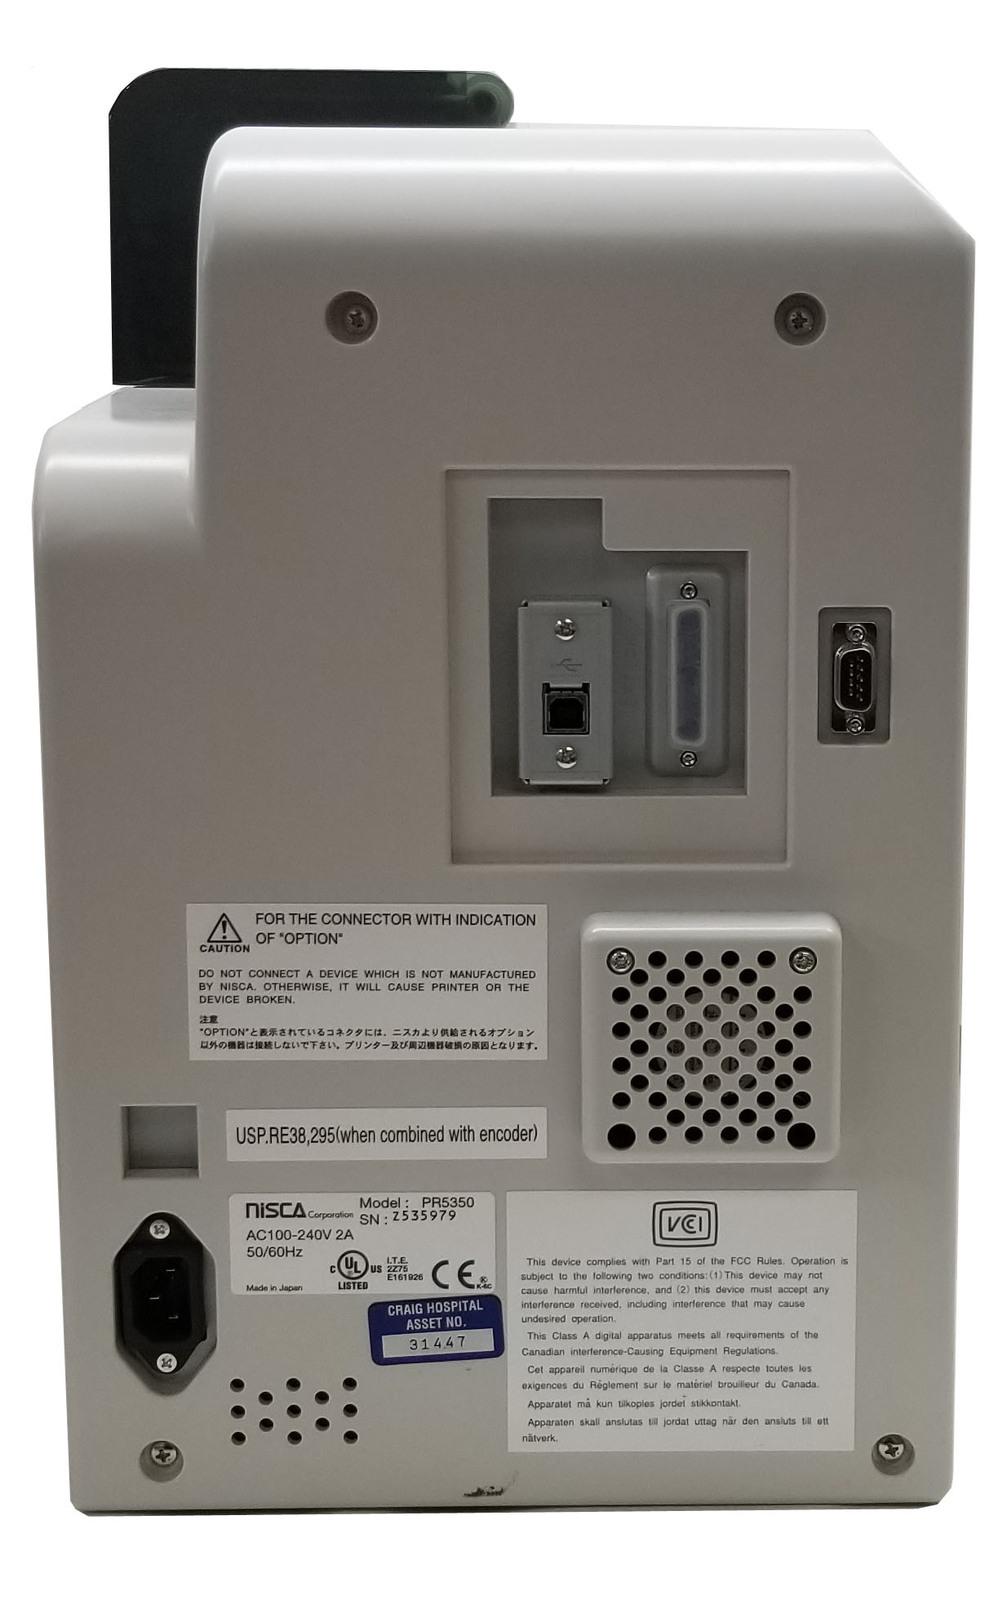 Nisca PR 5350 Dual Sided ID Card Printer Bin:2